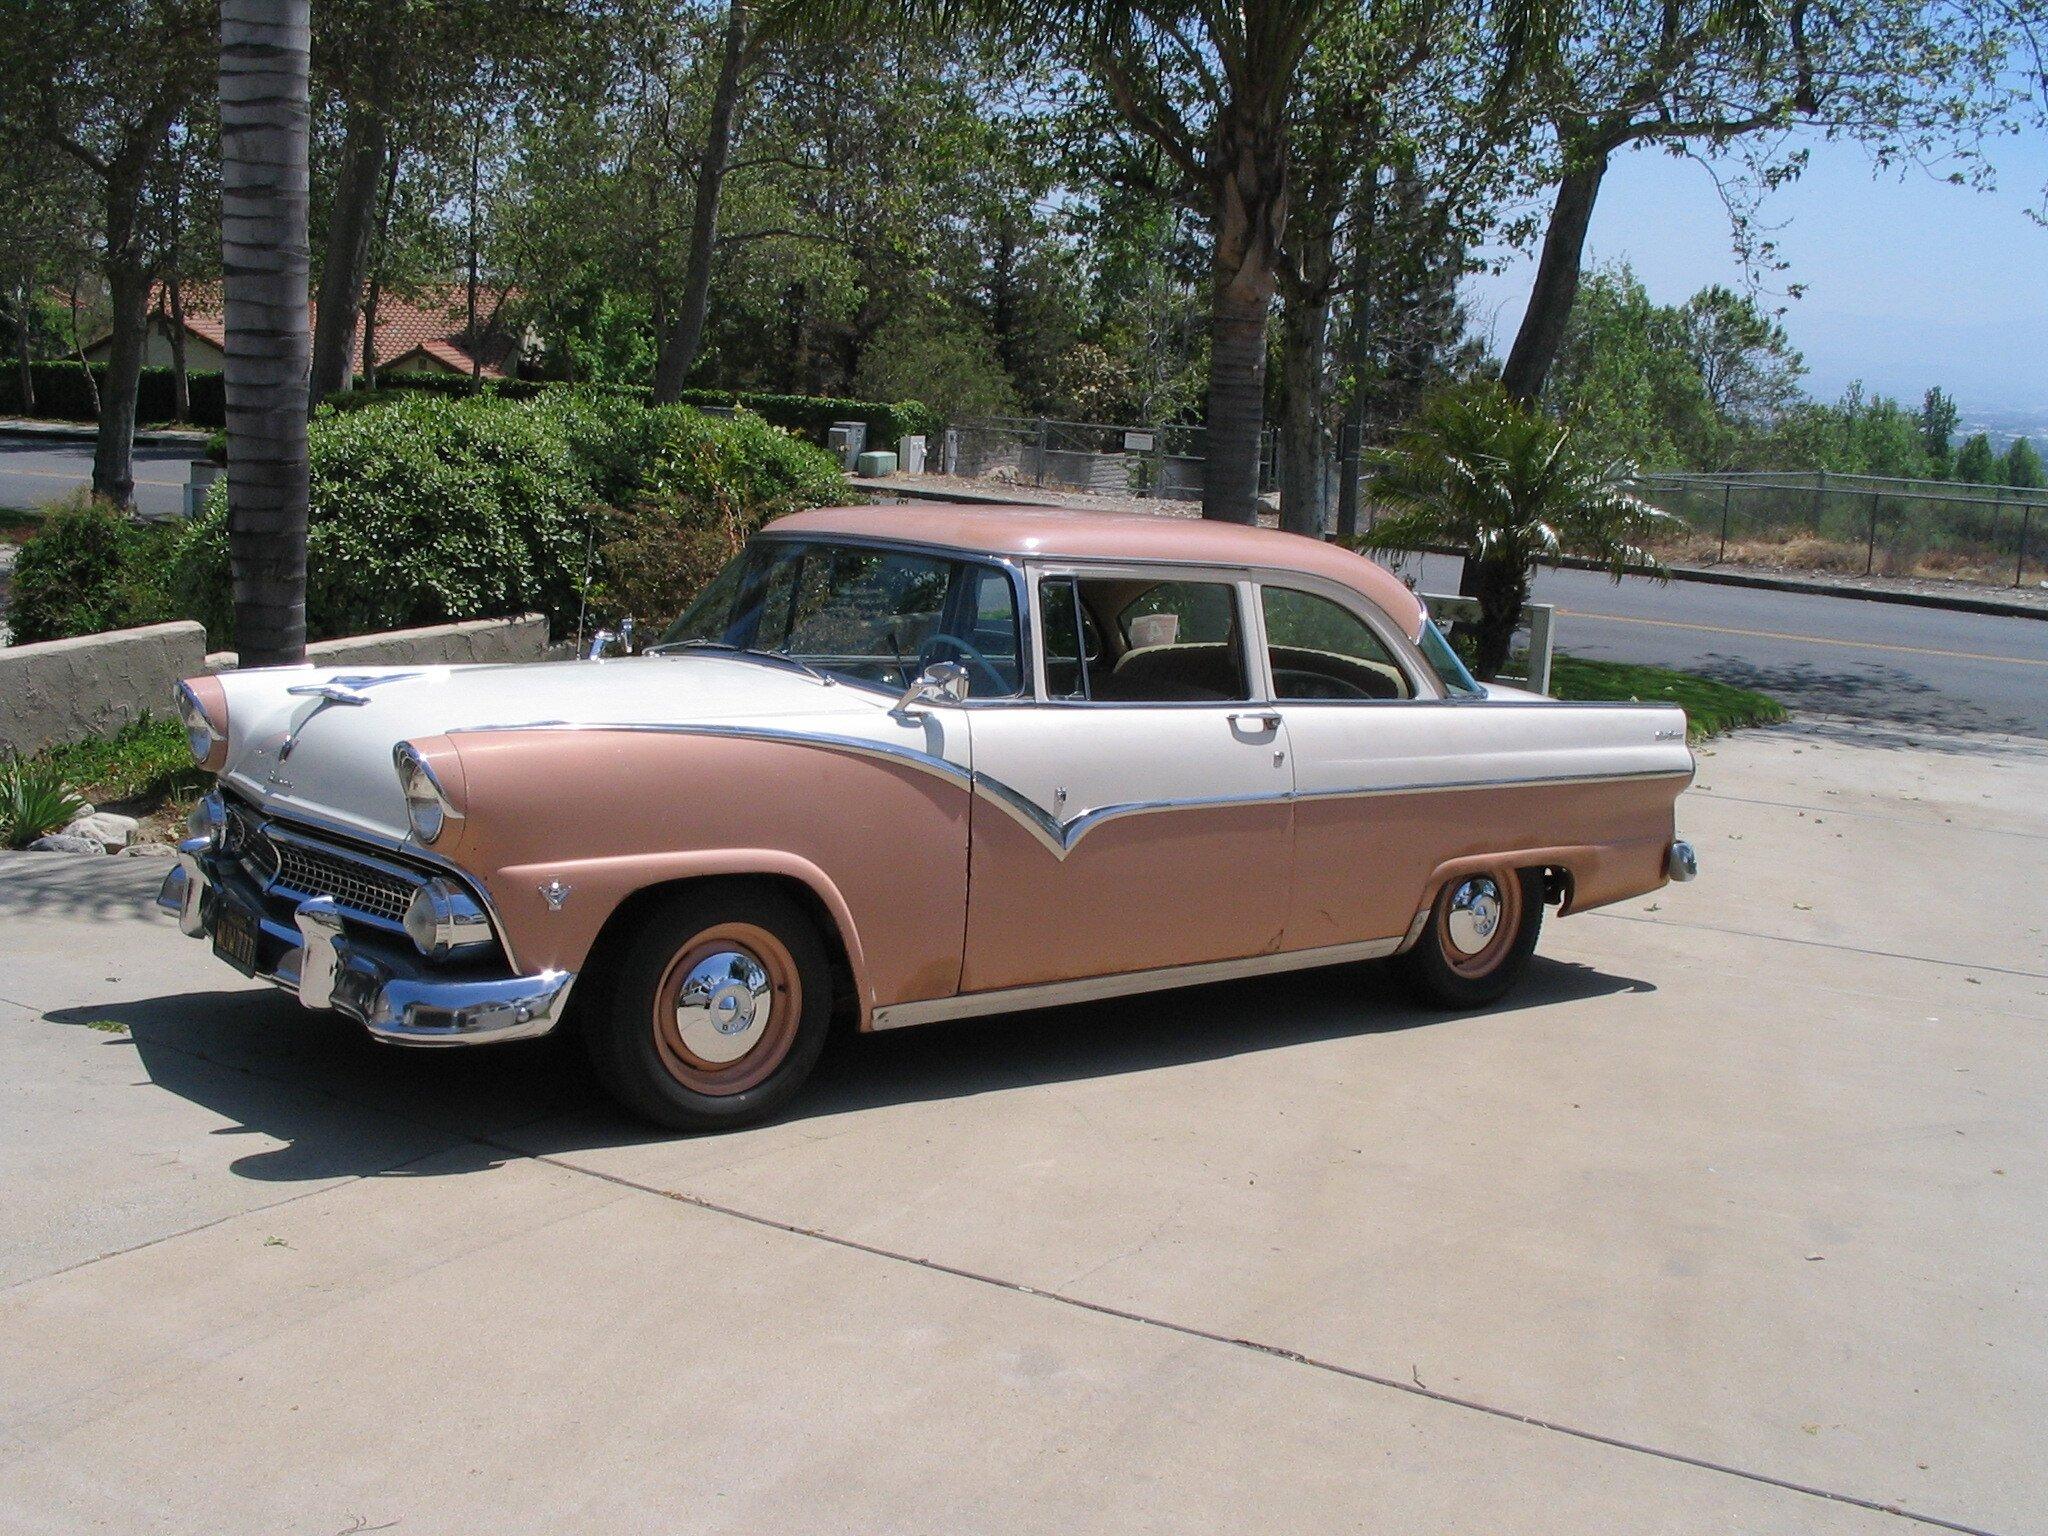 1955 Ford Fairlane for sale 100879508 & 1955 Ford Fairlane Classics for Sale - Classics on Autotrader markmcfarlin.com